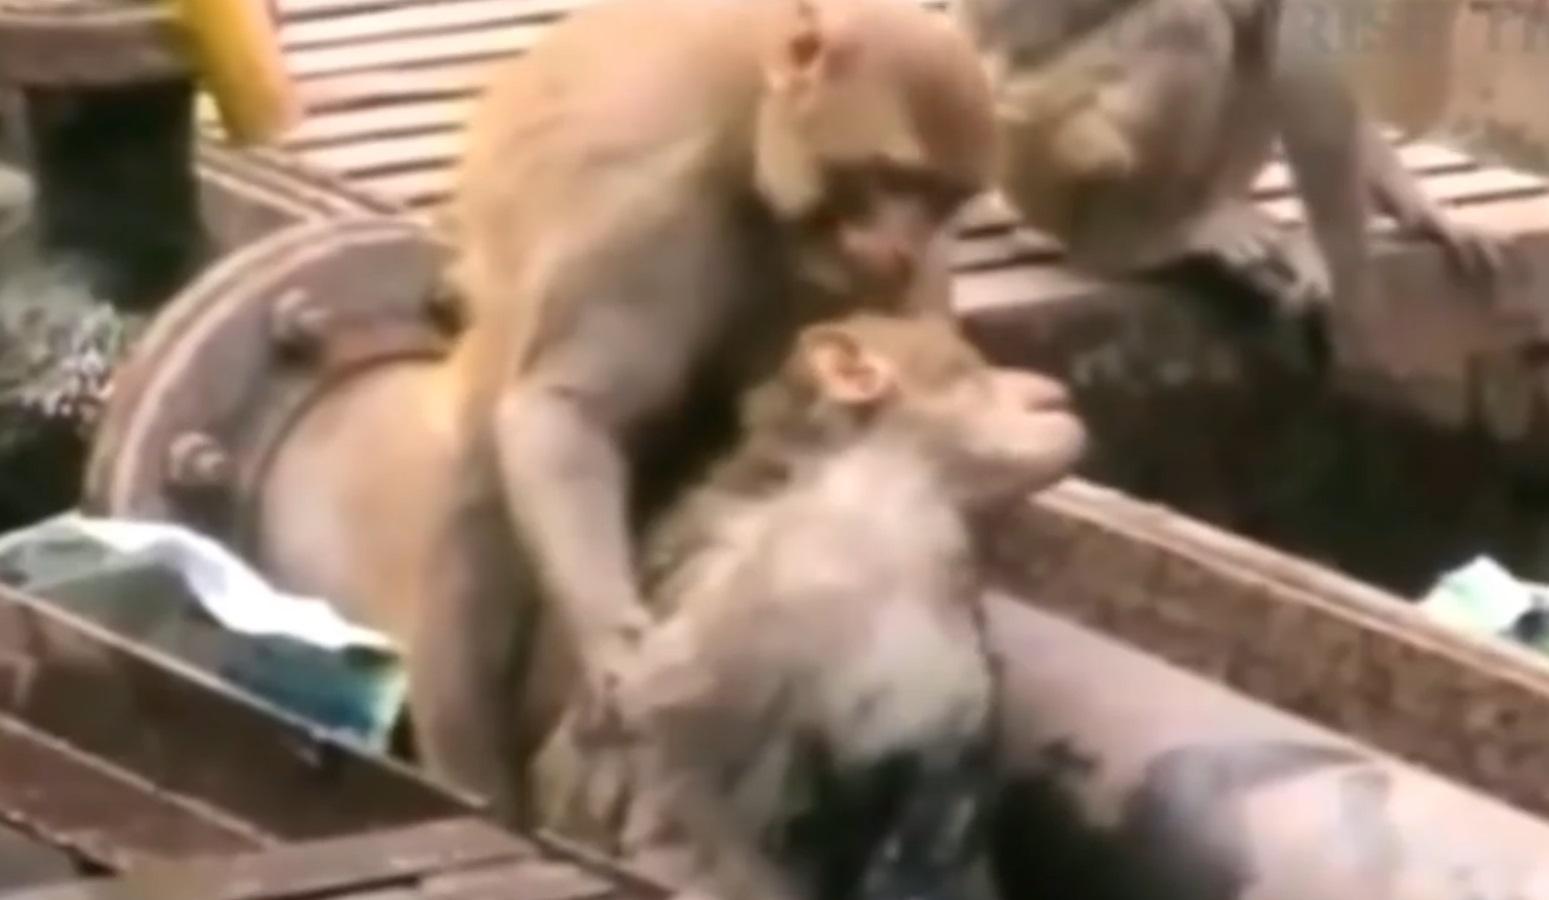 Monkey Revives Electrocutated Companion